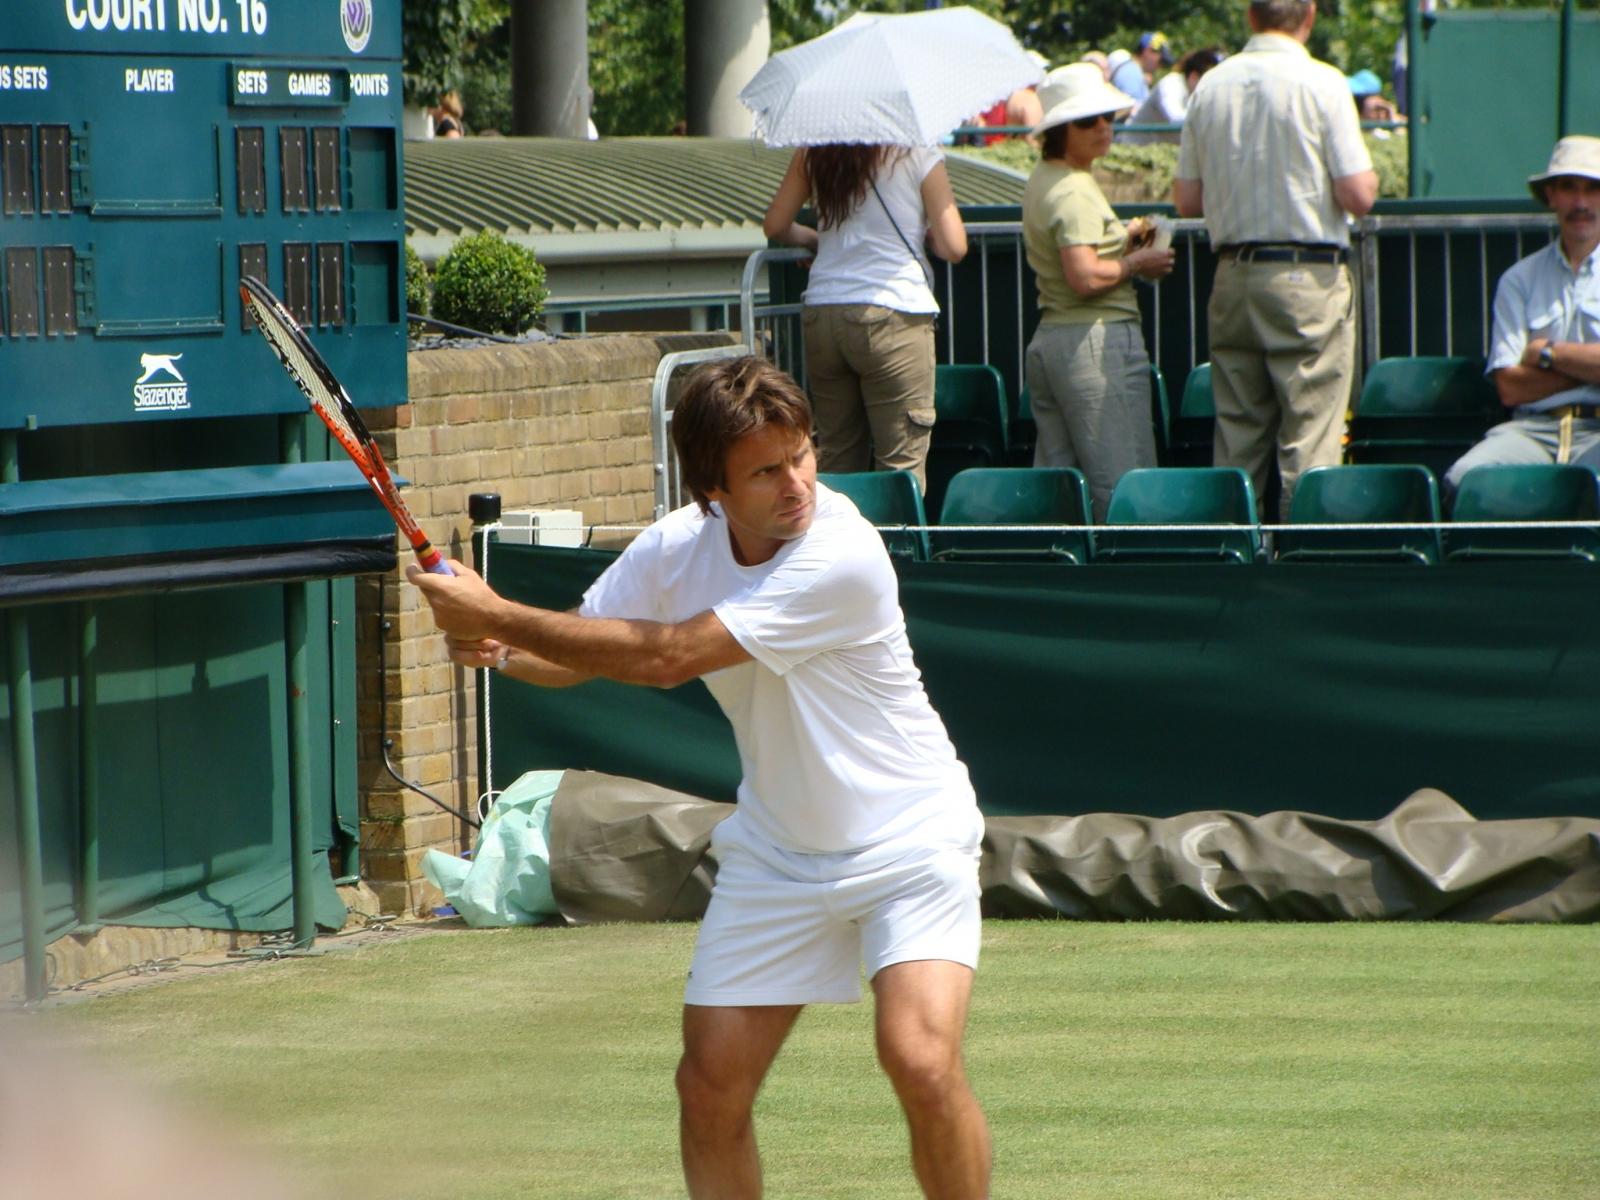 20_Santoro Wimbledon 2009